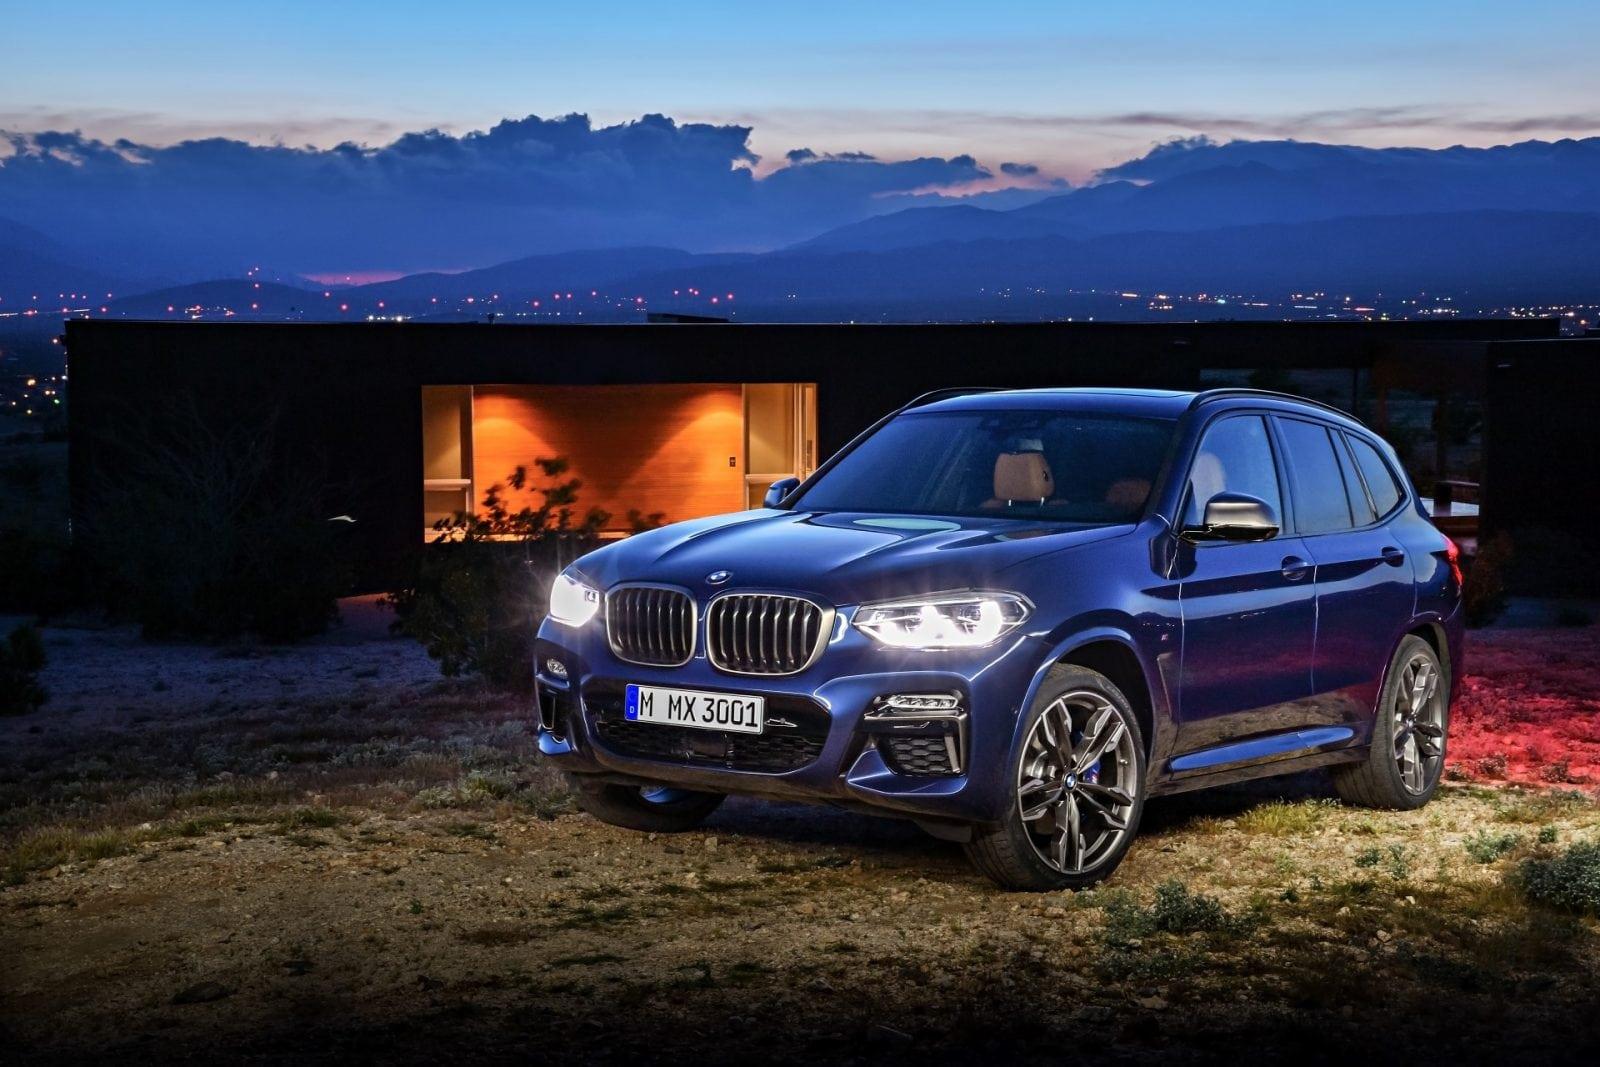 BMW X3 G01 2018 xDrive M40i Phytonic Blue Metallic With Leder Vernasca Cognac